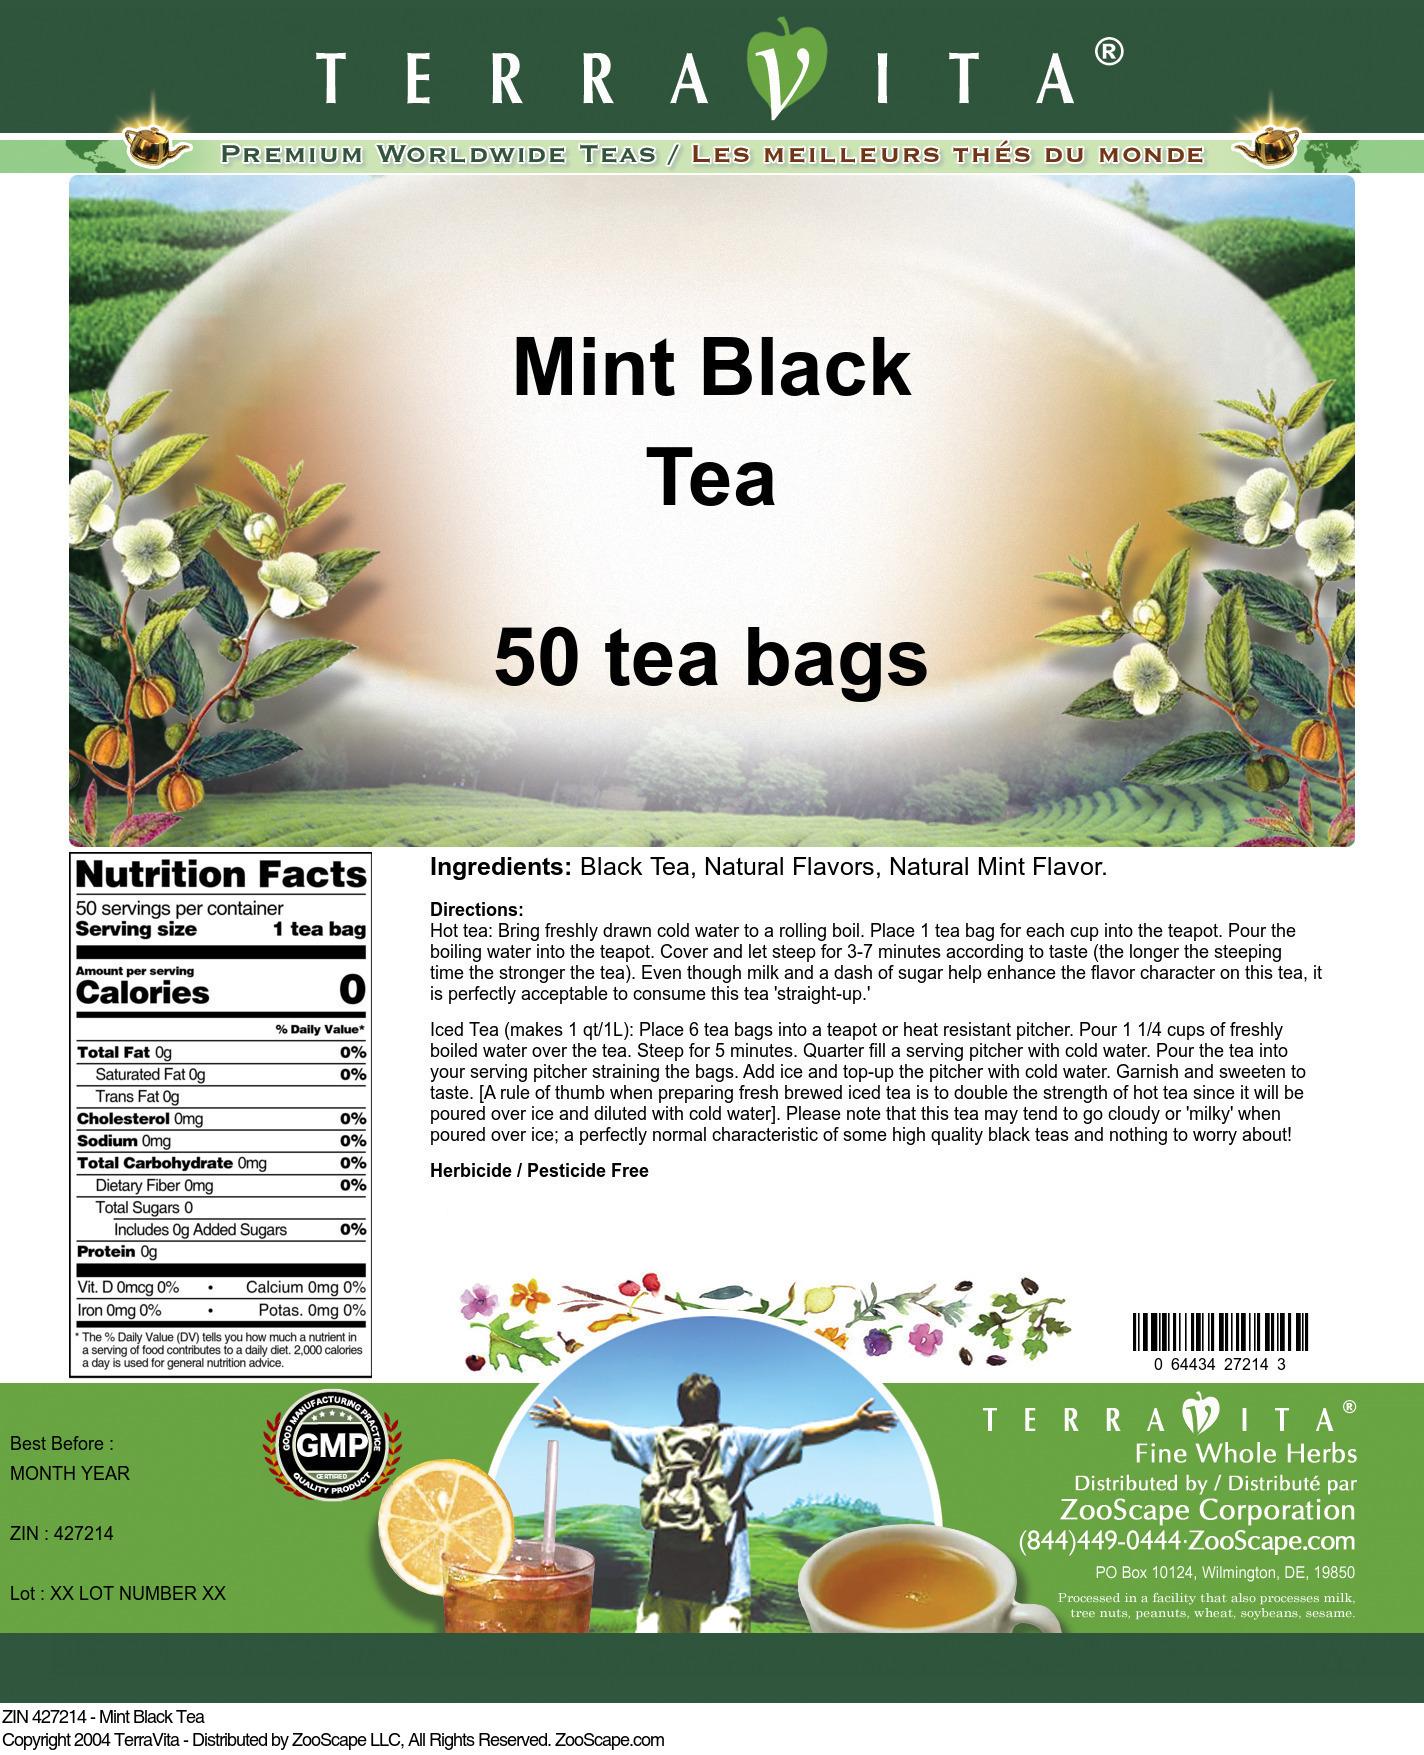 Mint Black Tea